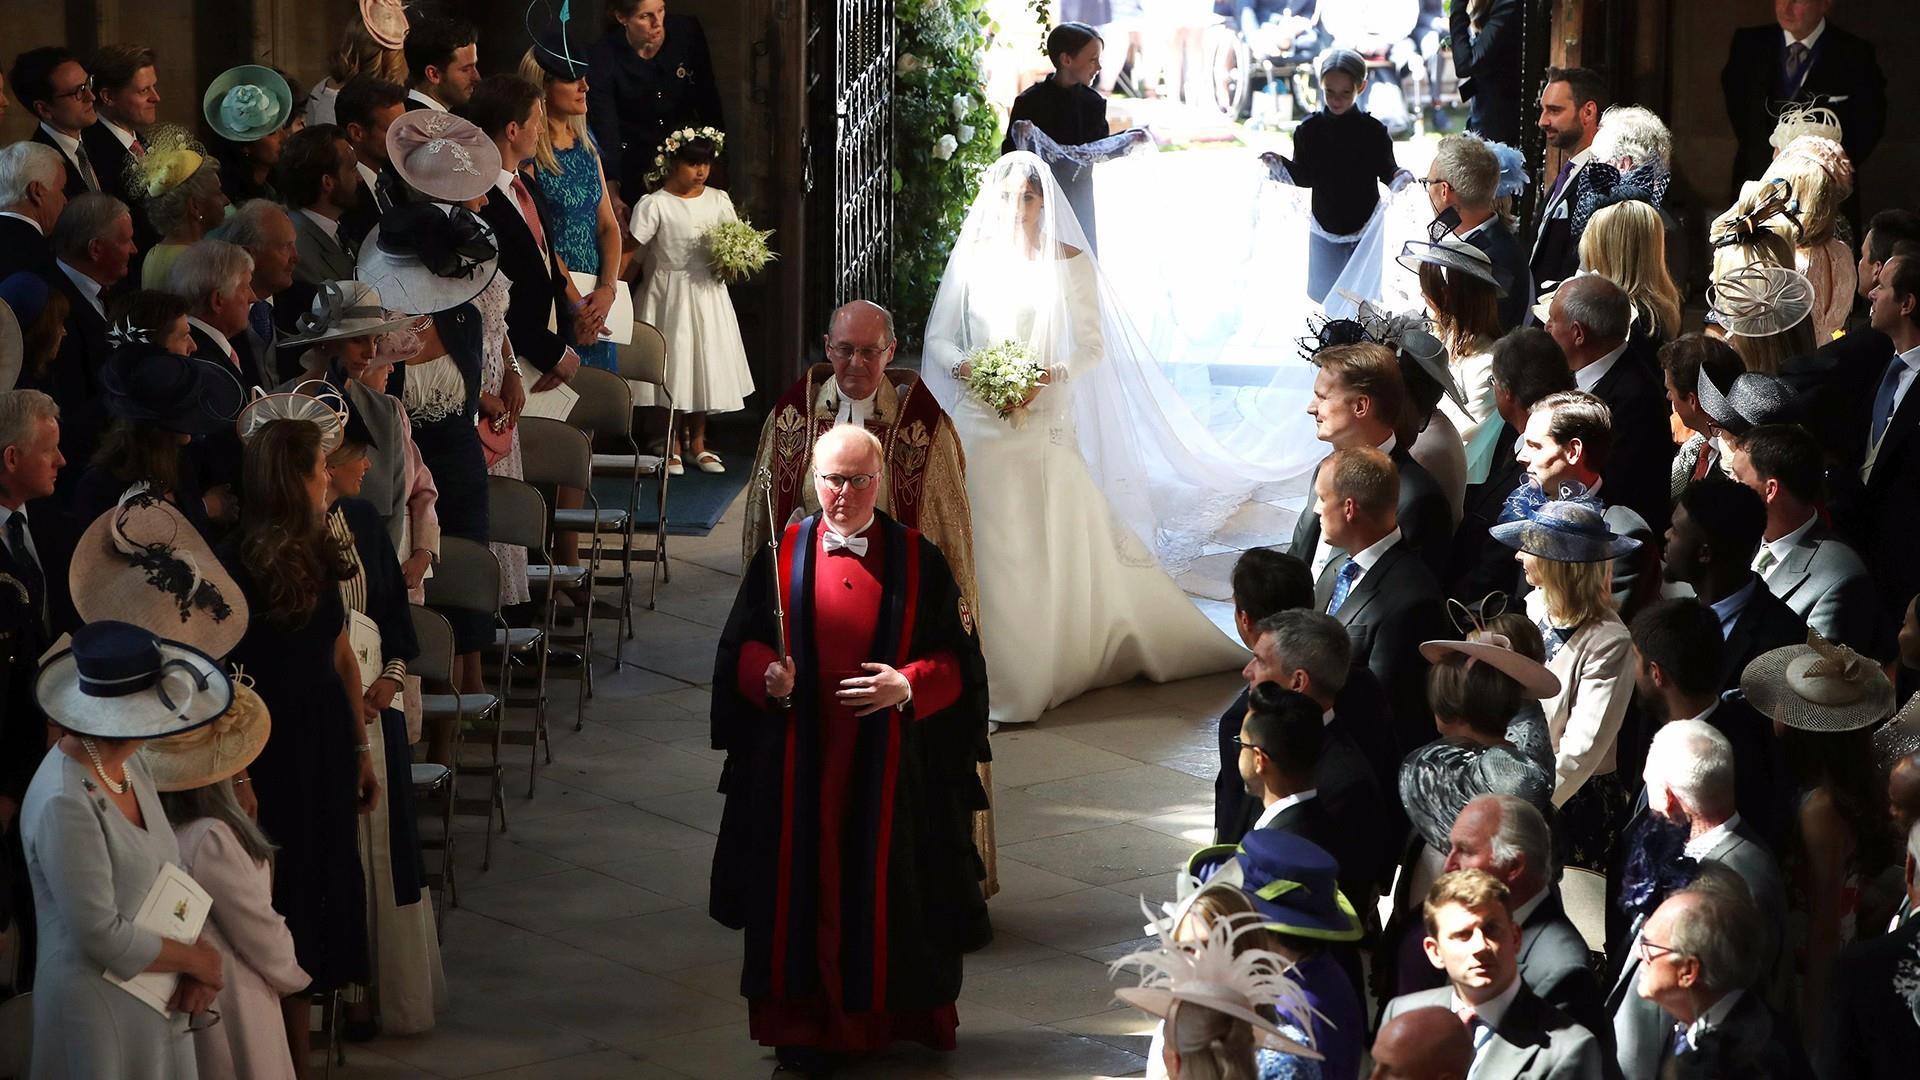 Royal Wedding See Meghan Markle Walk Down The Aisle